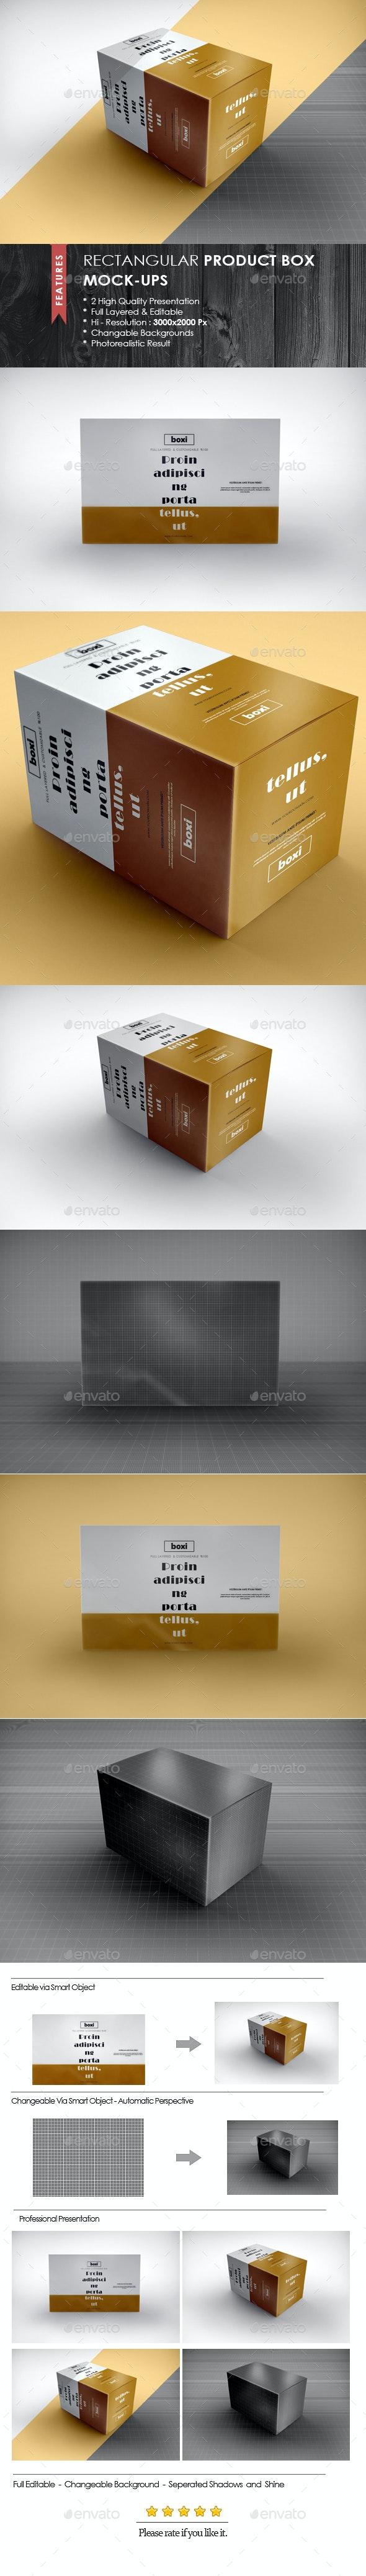 Rectangular Product Box Mock-Ups - Packaging Product Mock-Ups